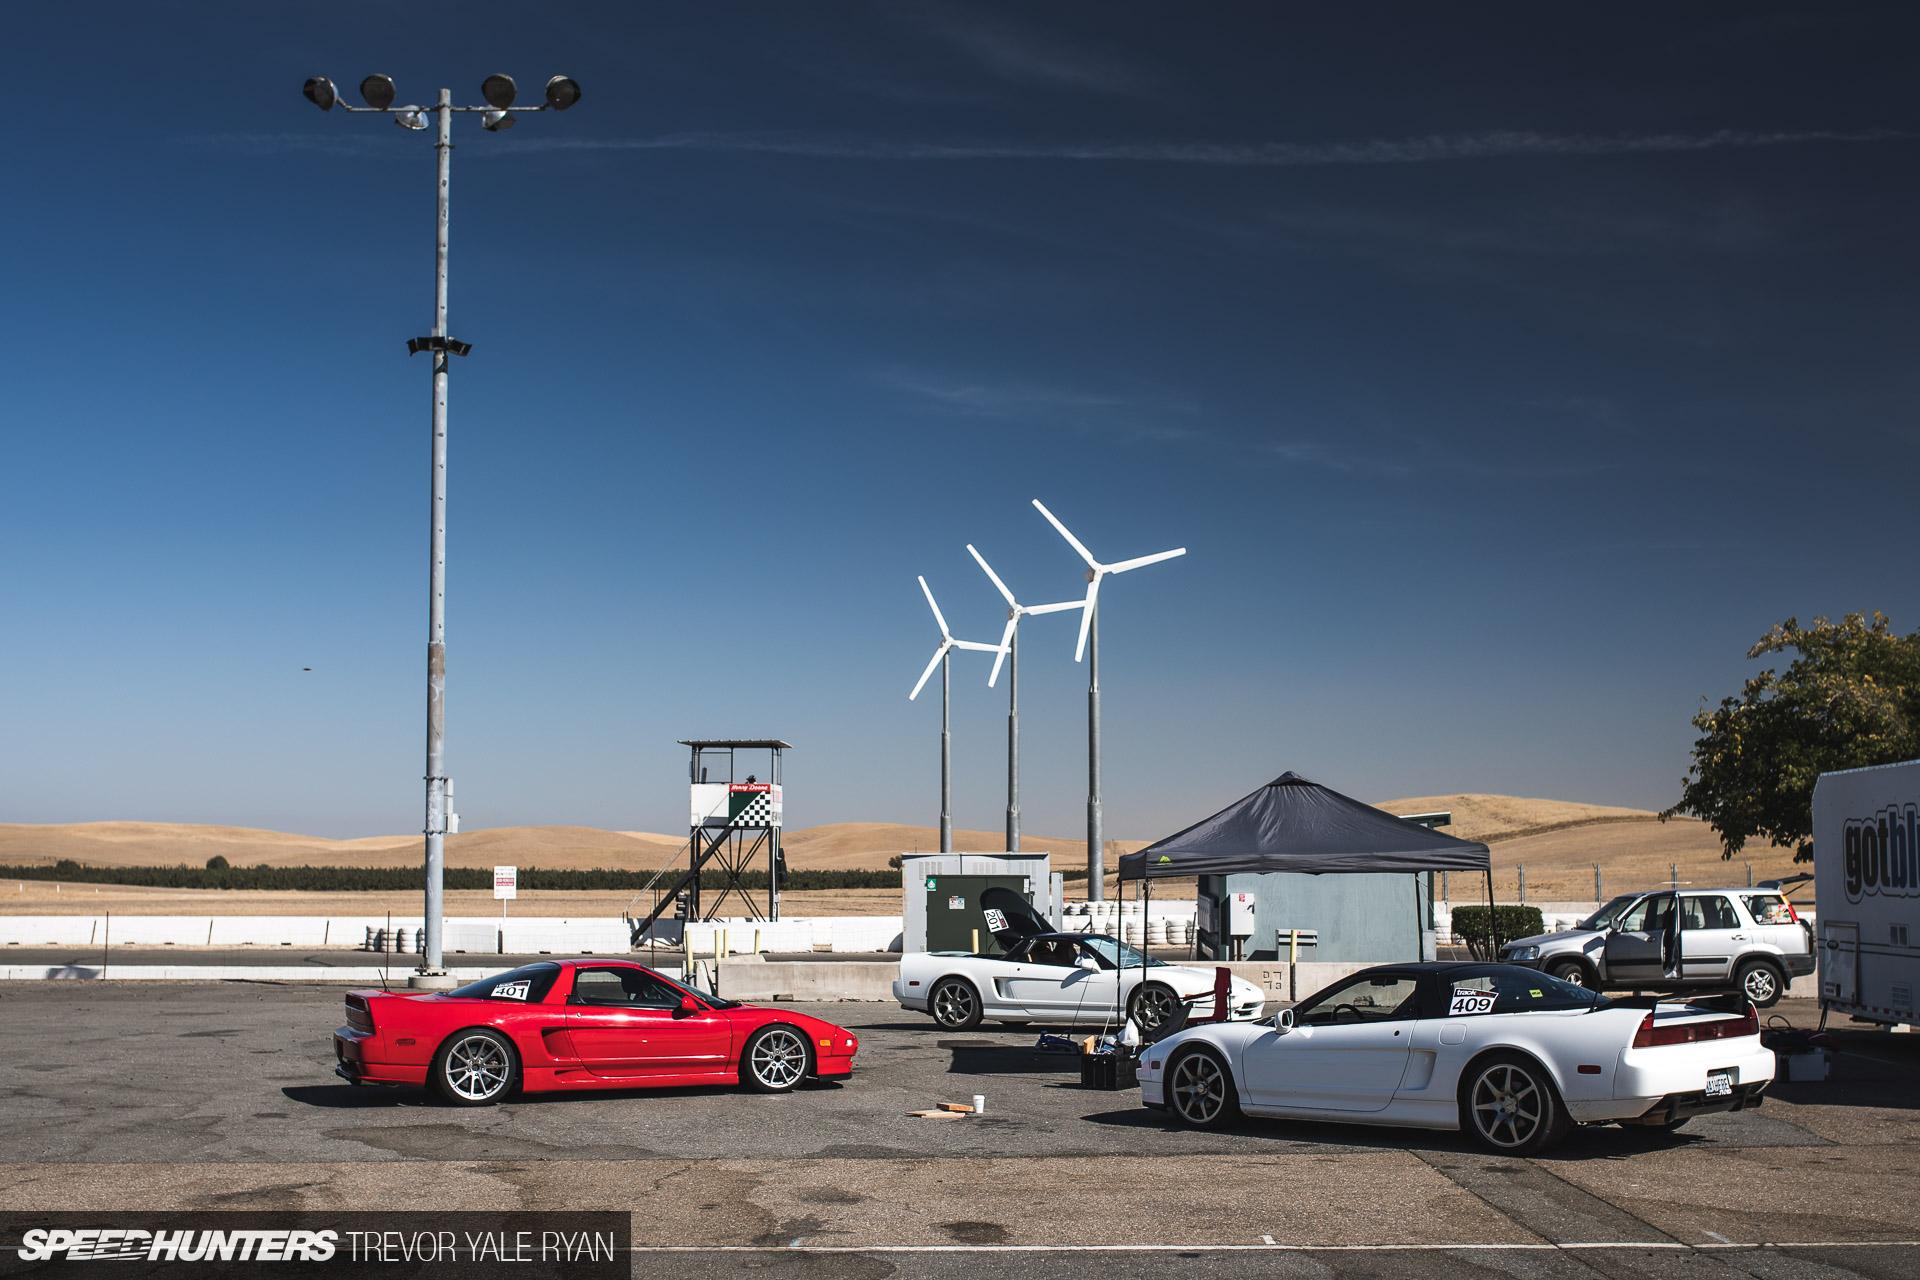 NSXPO Meets Type R Club At Thunderhill - By Trevor Ryan